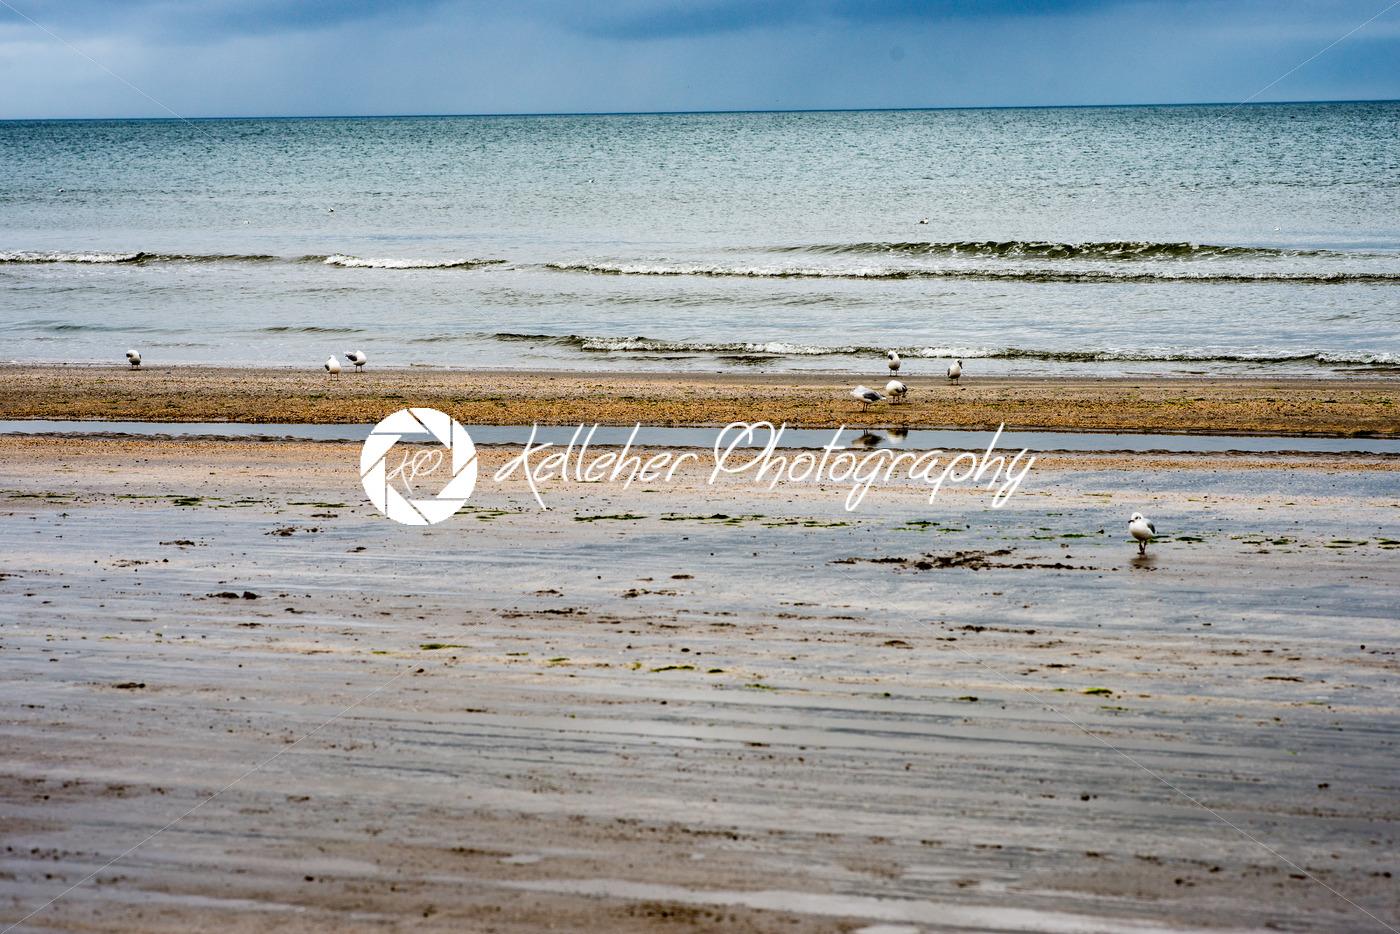 Beach on overcast rainy day in Bettystown, Ireland - Kelleher Photography Store